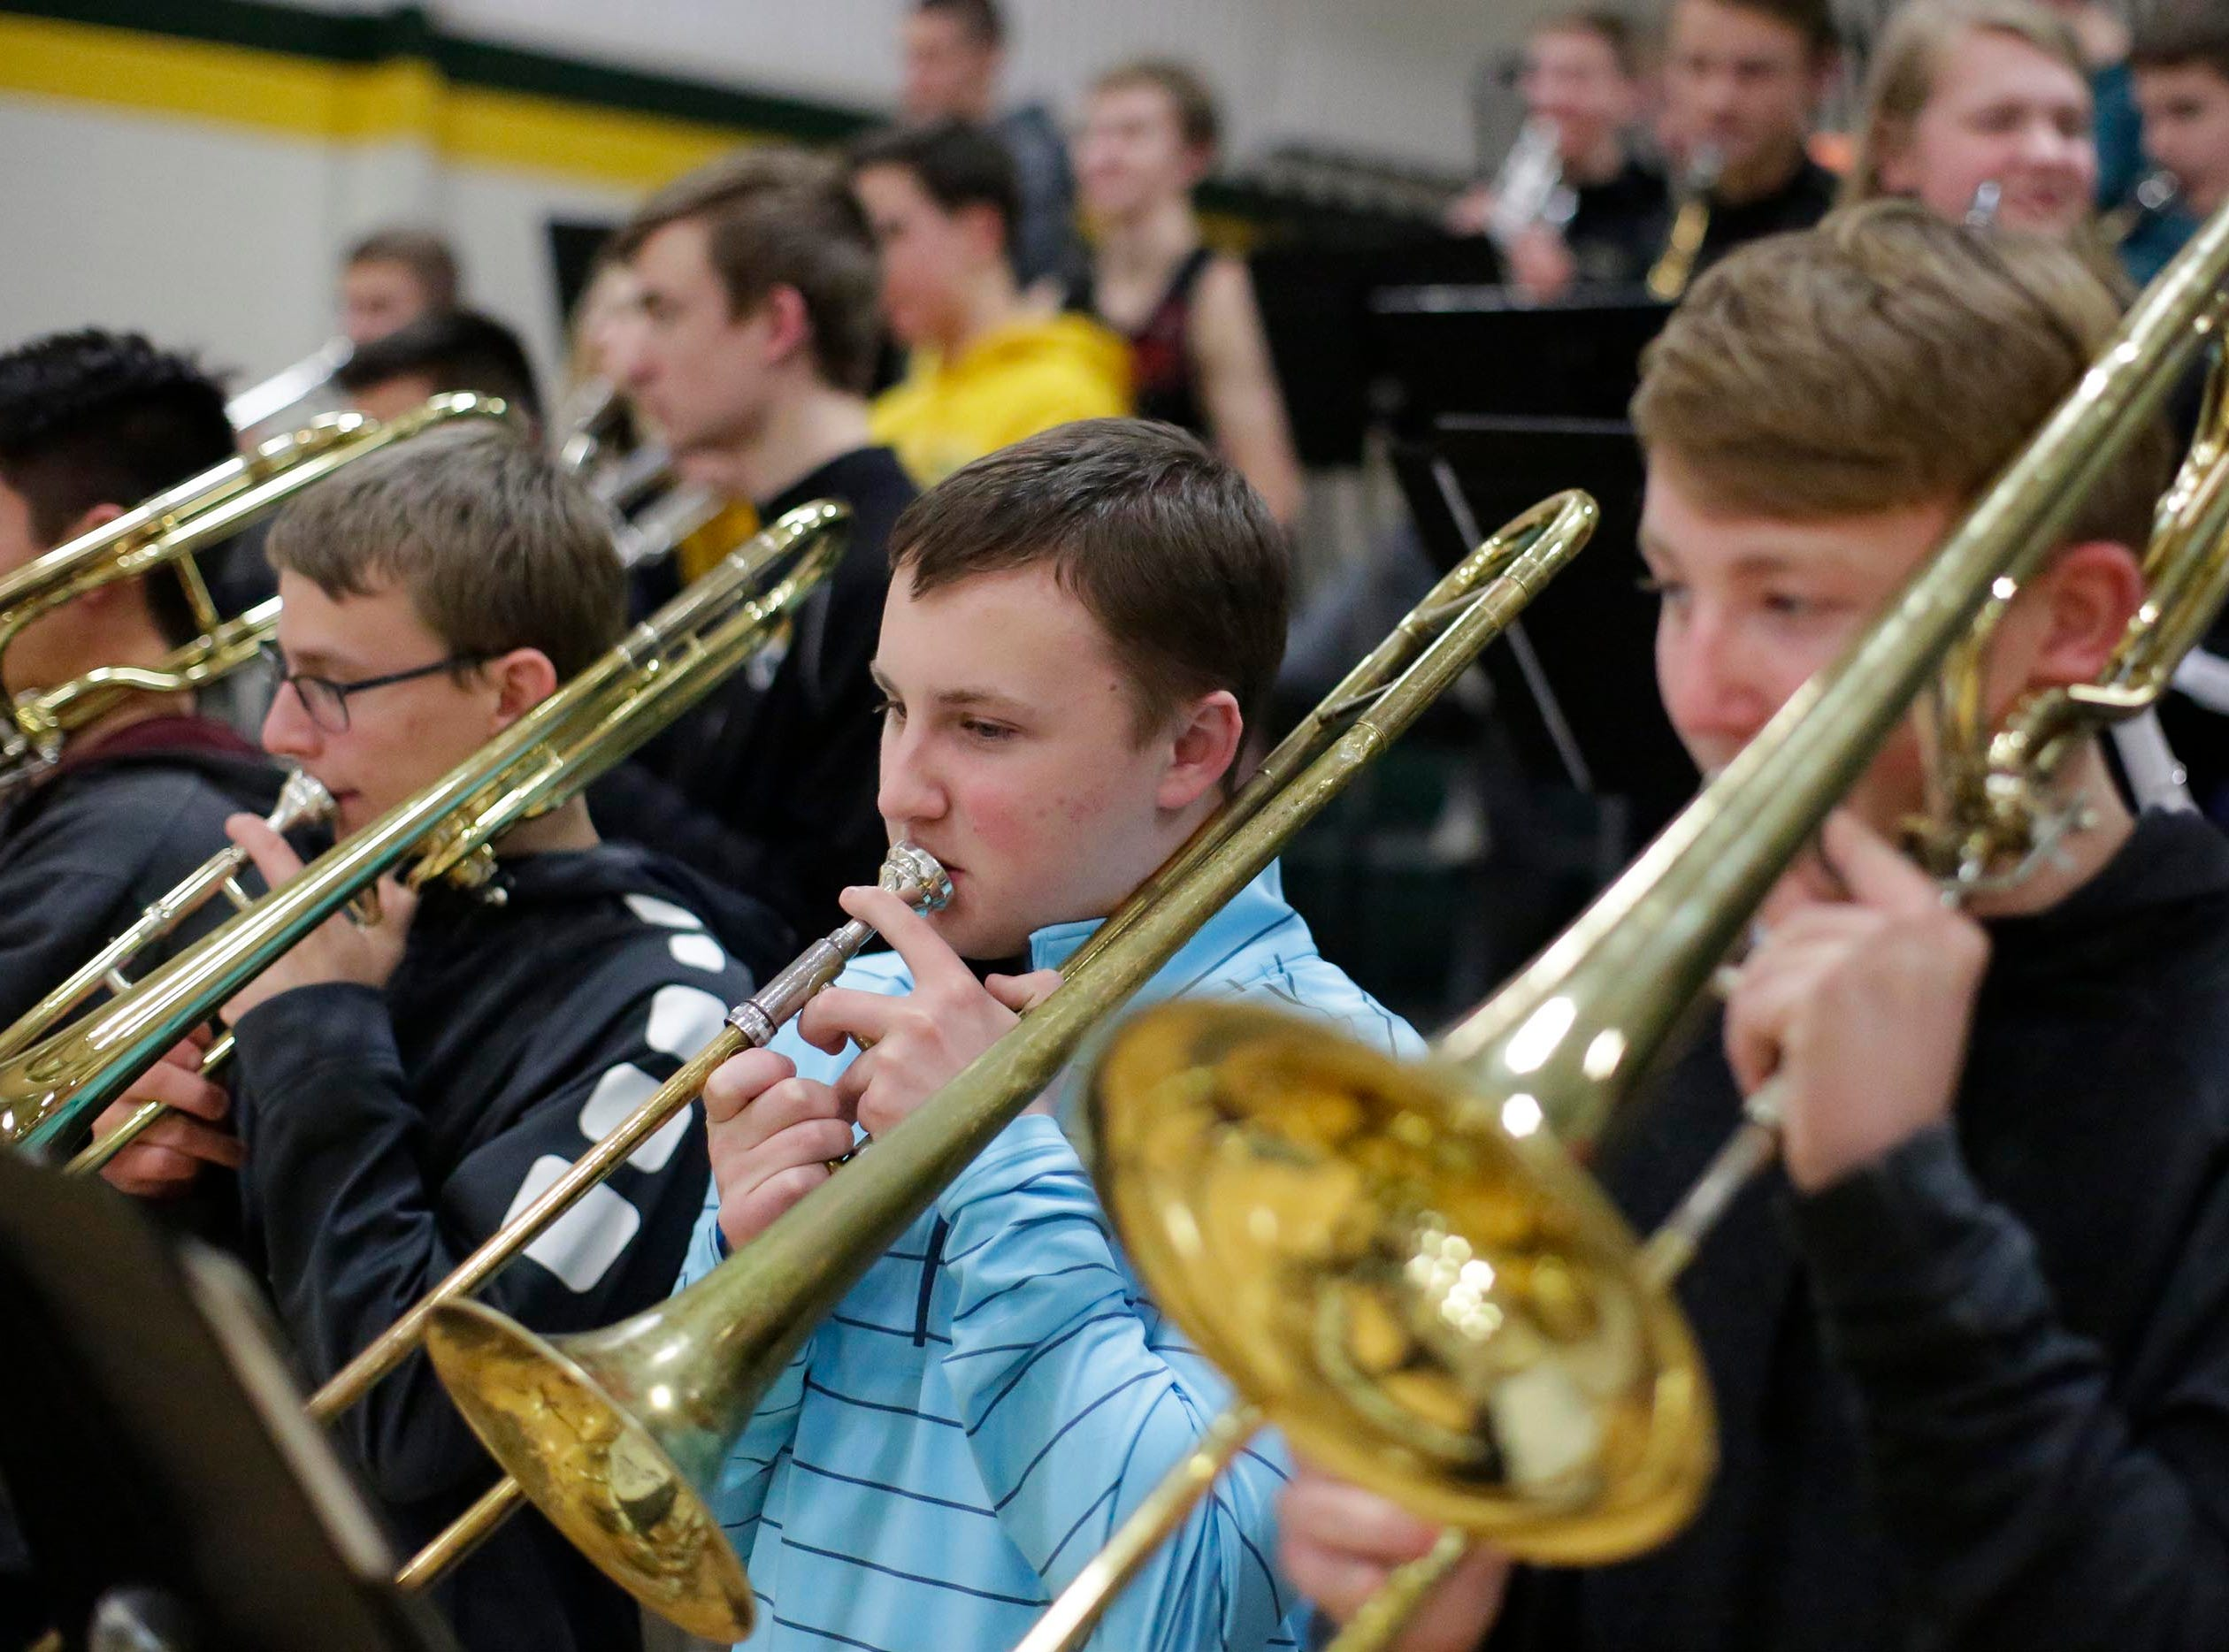 Sheboygan Lutheran's pep band trombonists perform before the game between Sheboygan Lutheran and Sheboygan Christian, Thursday, January 24, 2019, in Sheboygan, Wis.